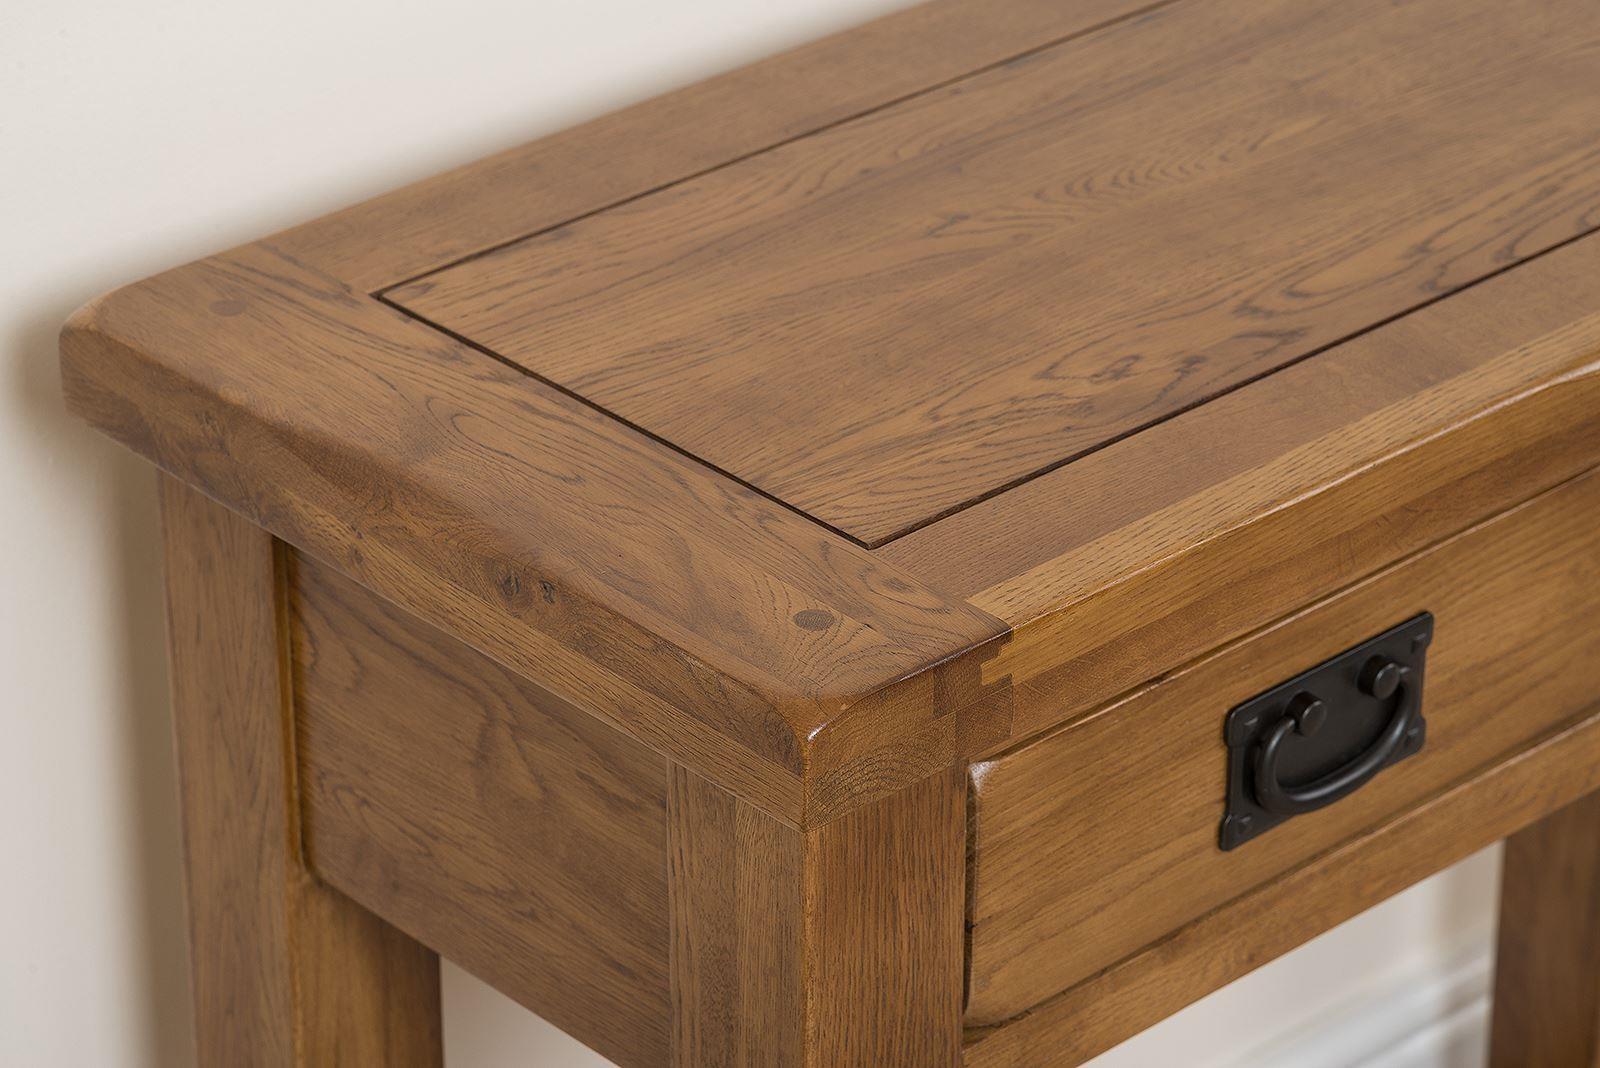 cotswold oak console table modern furniture direct. Black Bedroom Furniture Sets. Home Design Ideas